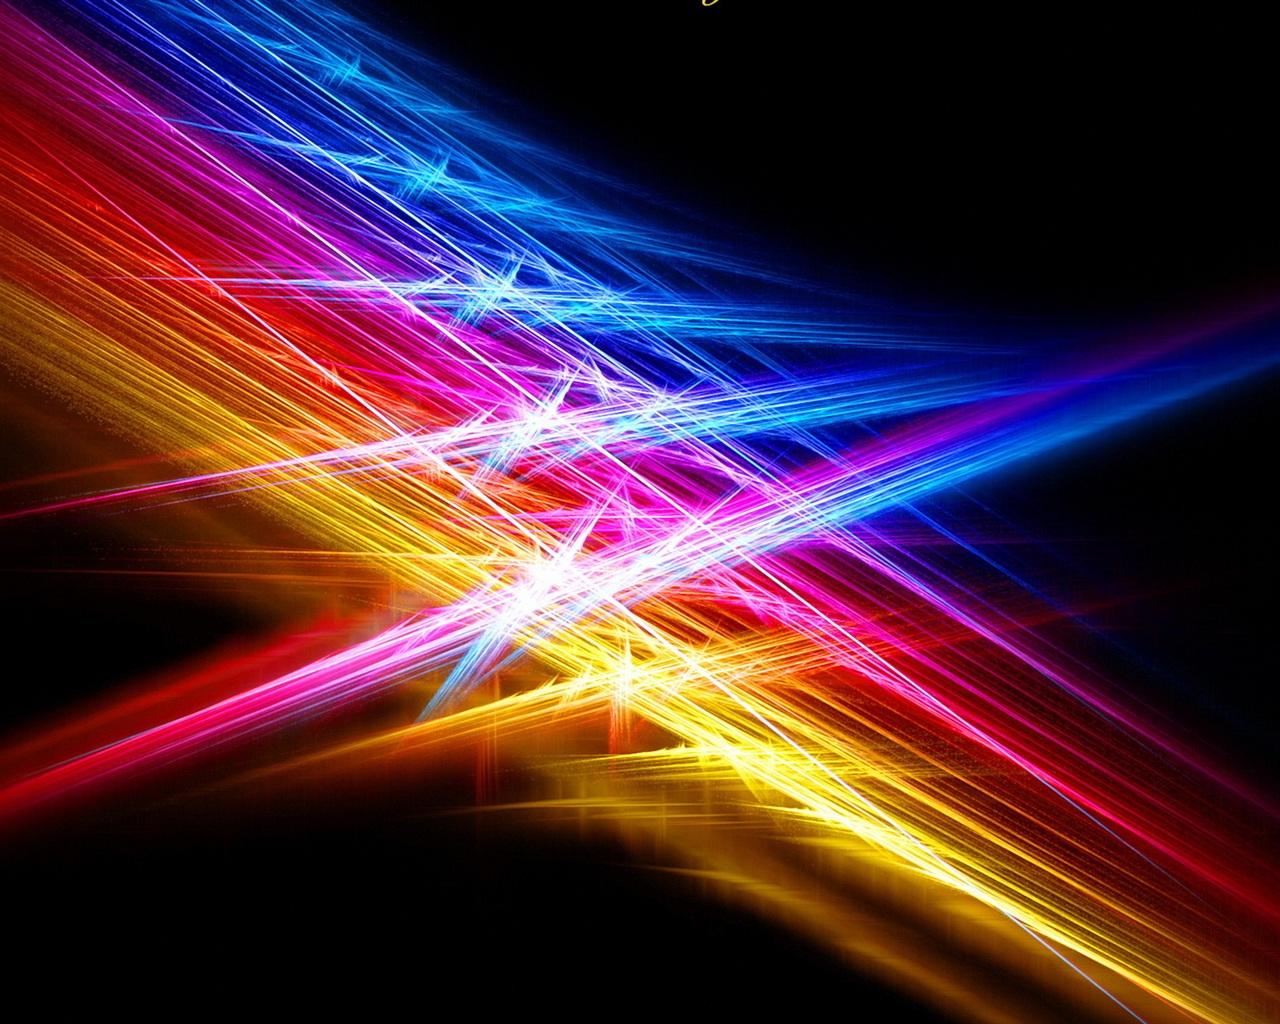 Line Color Light Beams Wallpaper 1280x1024 Resolution